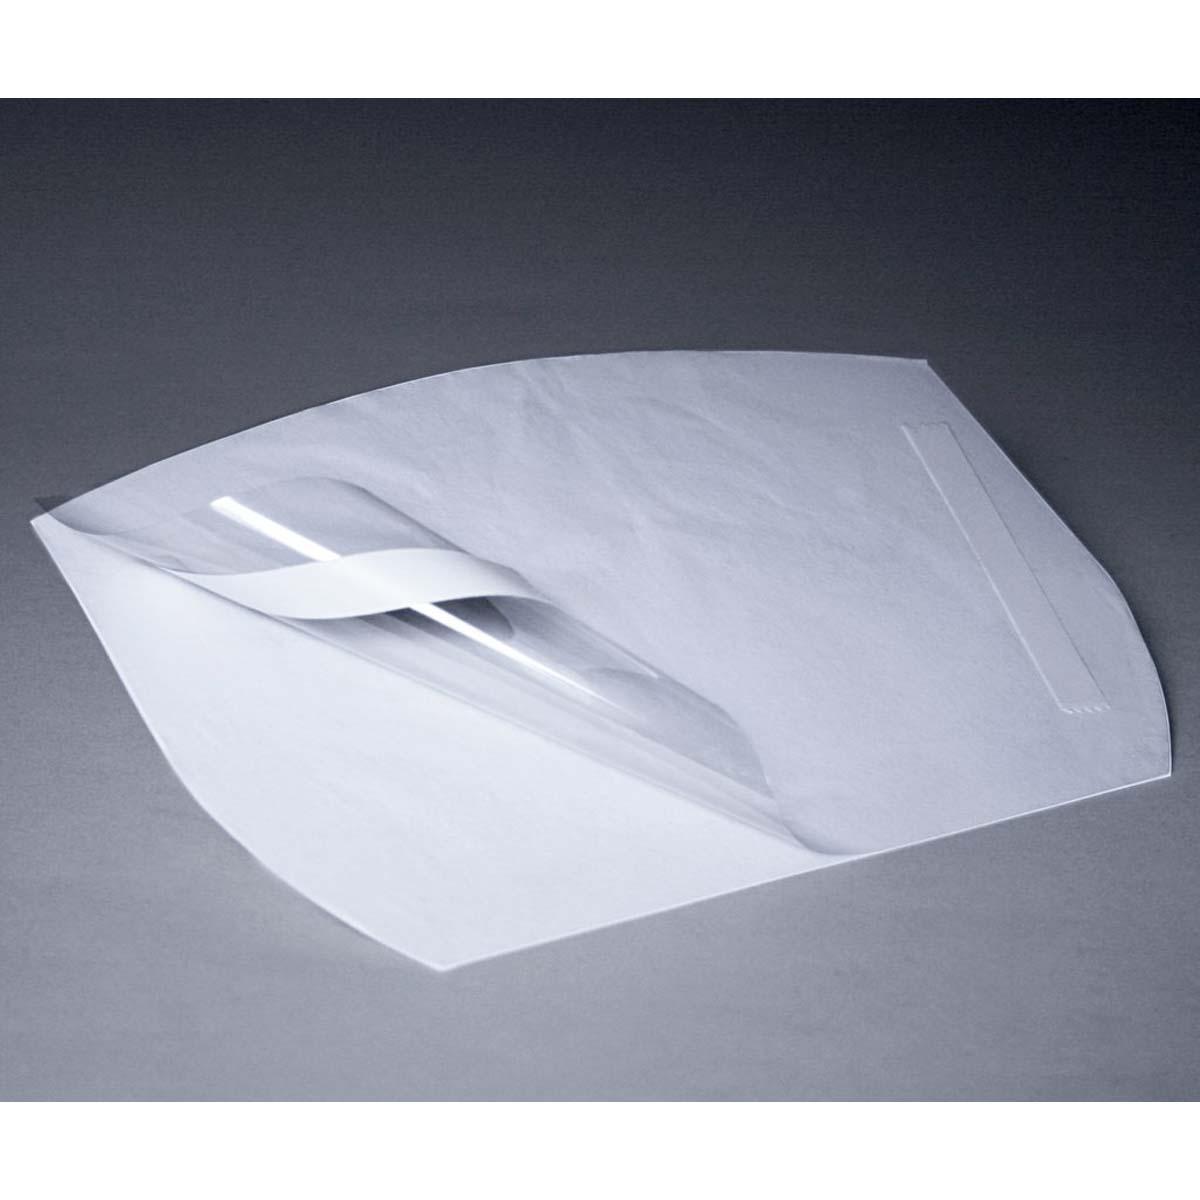 "3Mâ""¢ Versafloâ""¢ Peel-Off Visor Cover S-922, for S-600 S-700 and S-800 Assemblies"